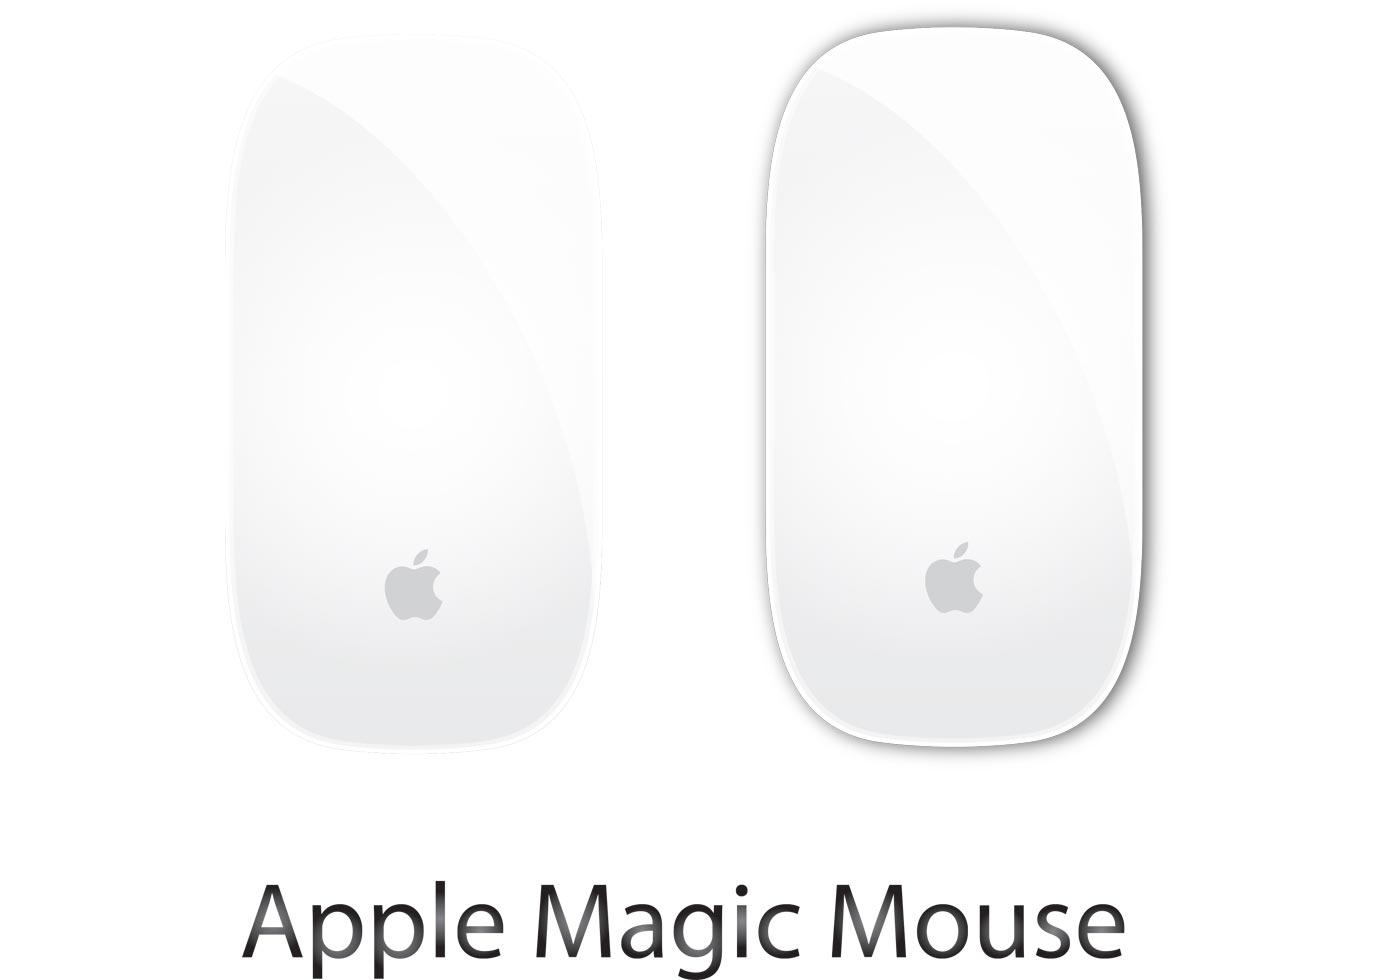 Apple Magic Mouse Vector